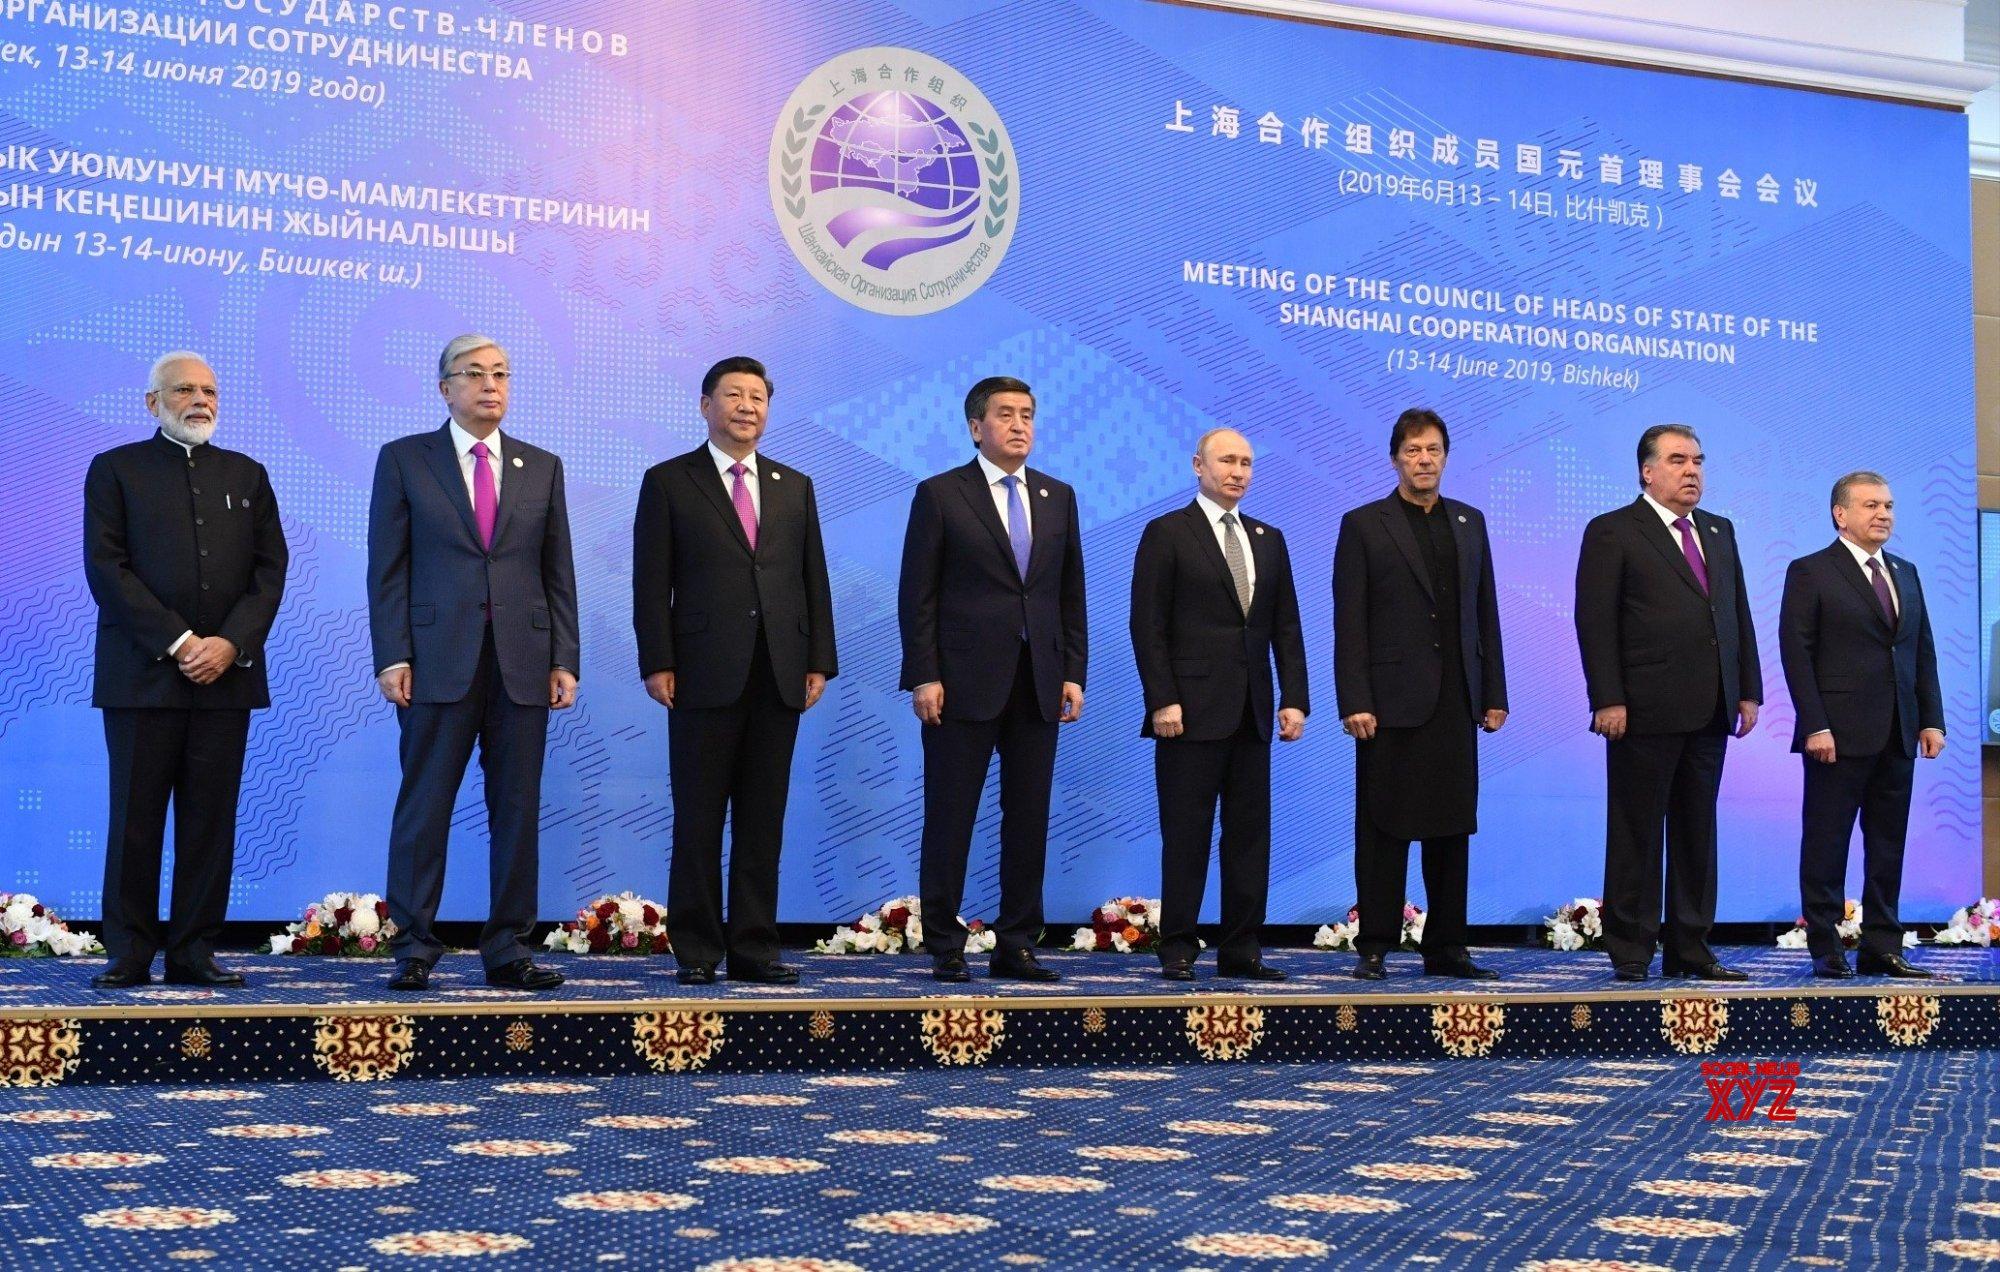 Bishkek: PM Modi with SCO leaders at 2019 SCO Summit #Gallery